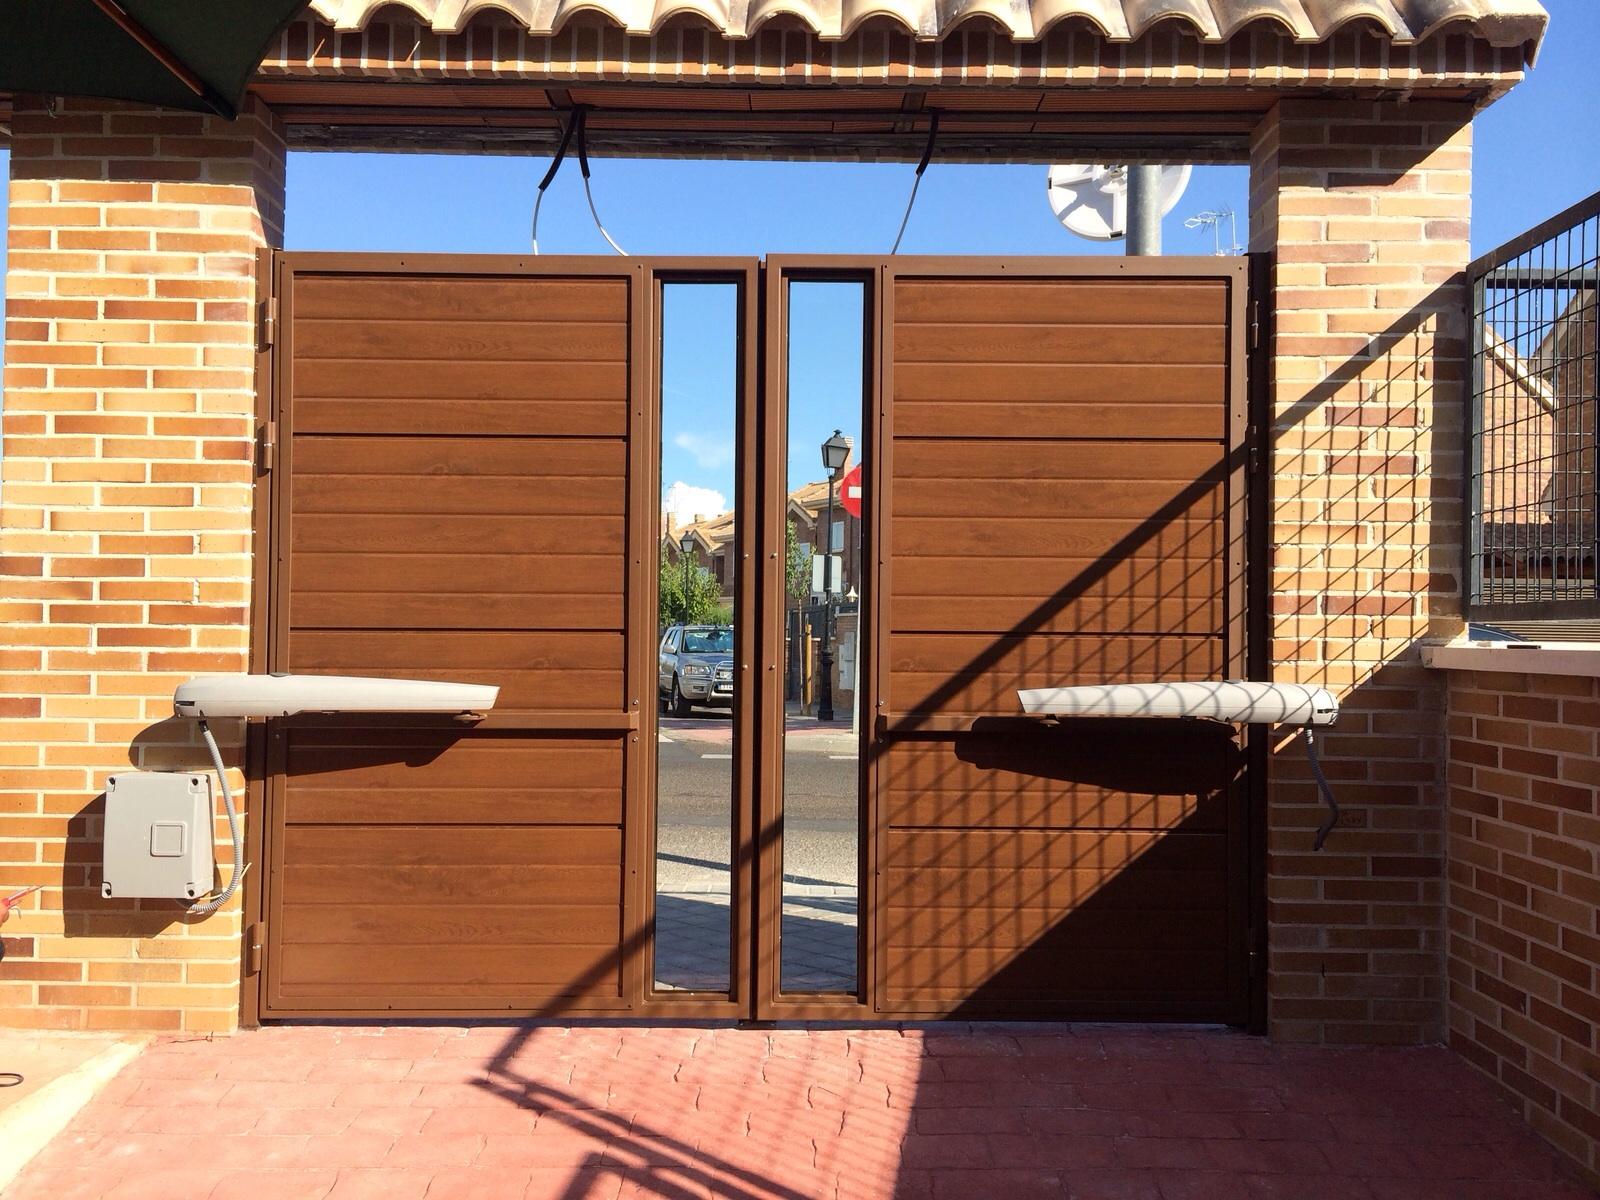 Puertas de panel imitaci n madera con inserto de cristal - Paneles imitacion madera ...